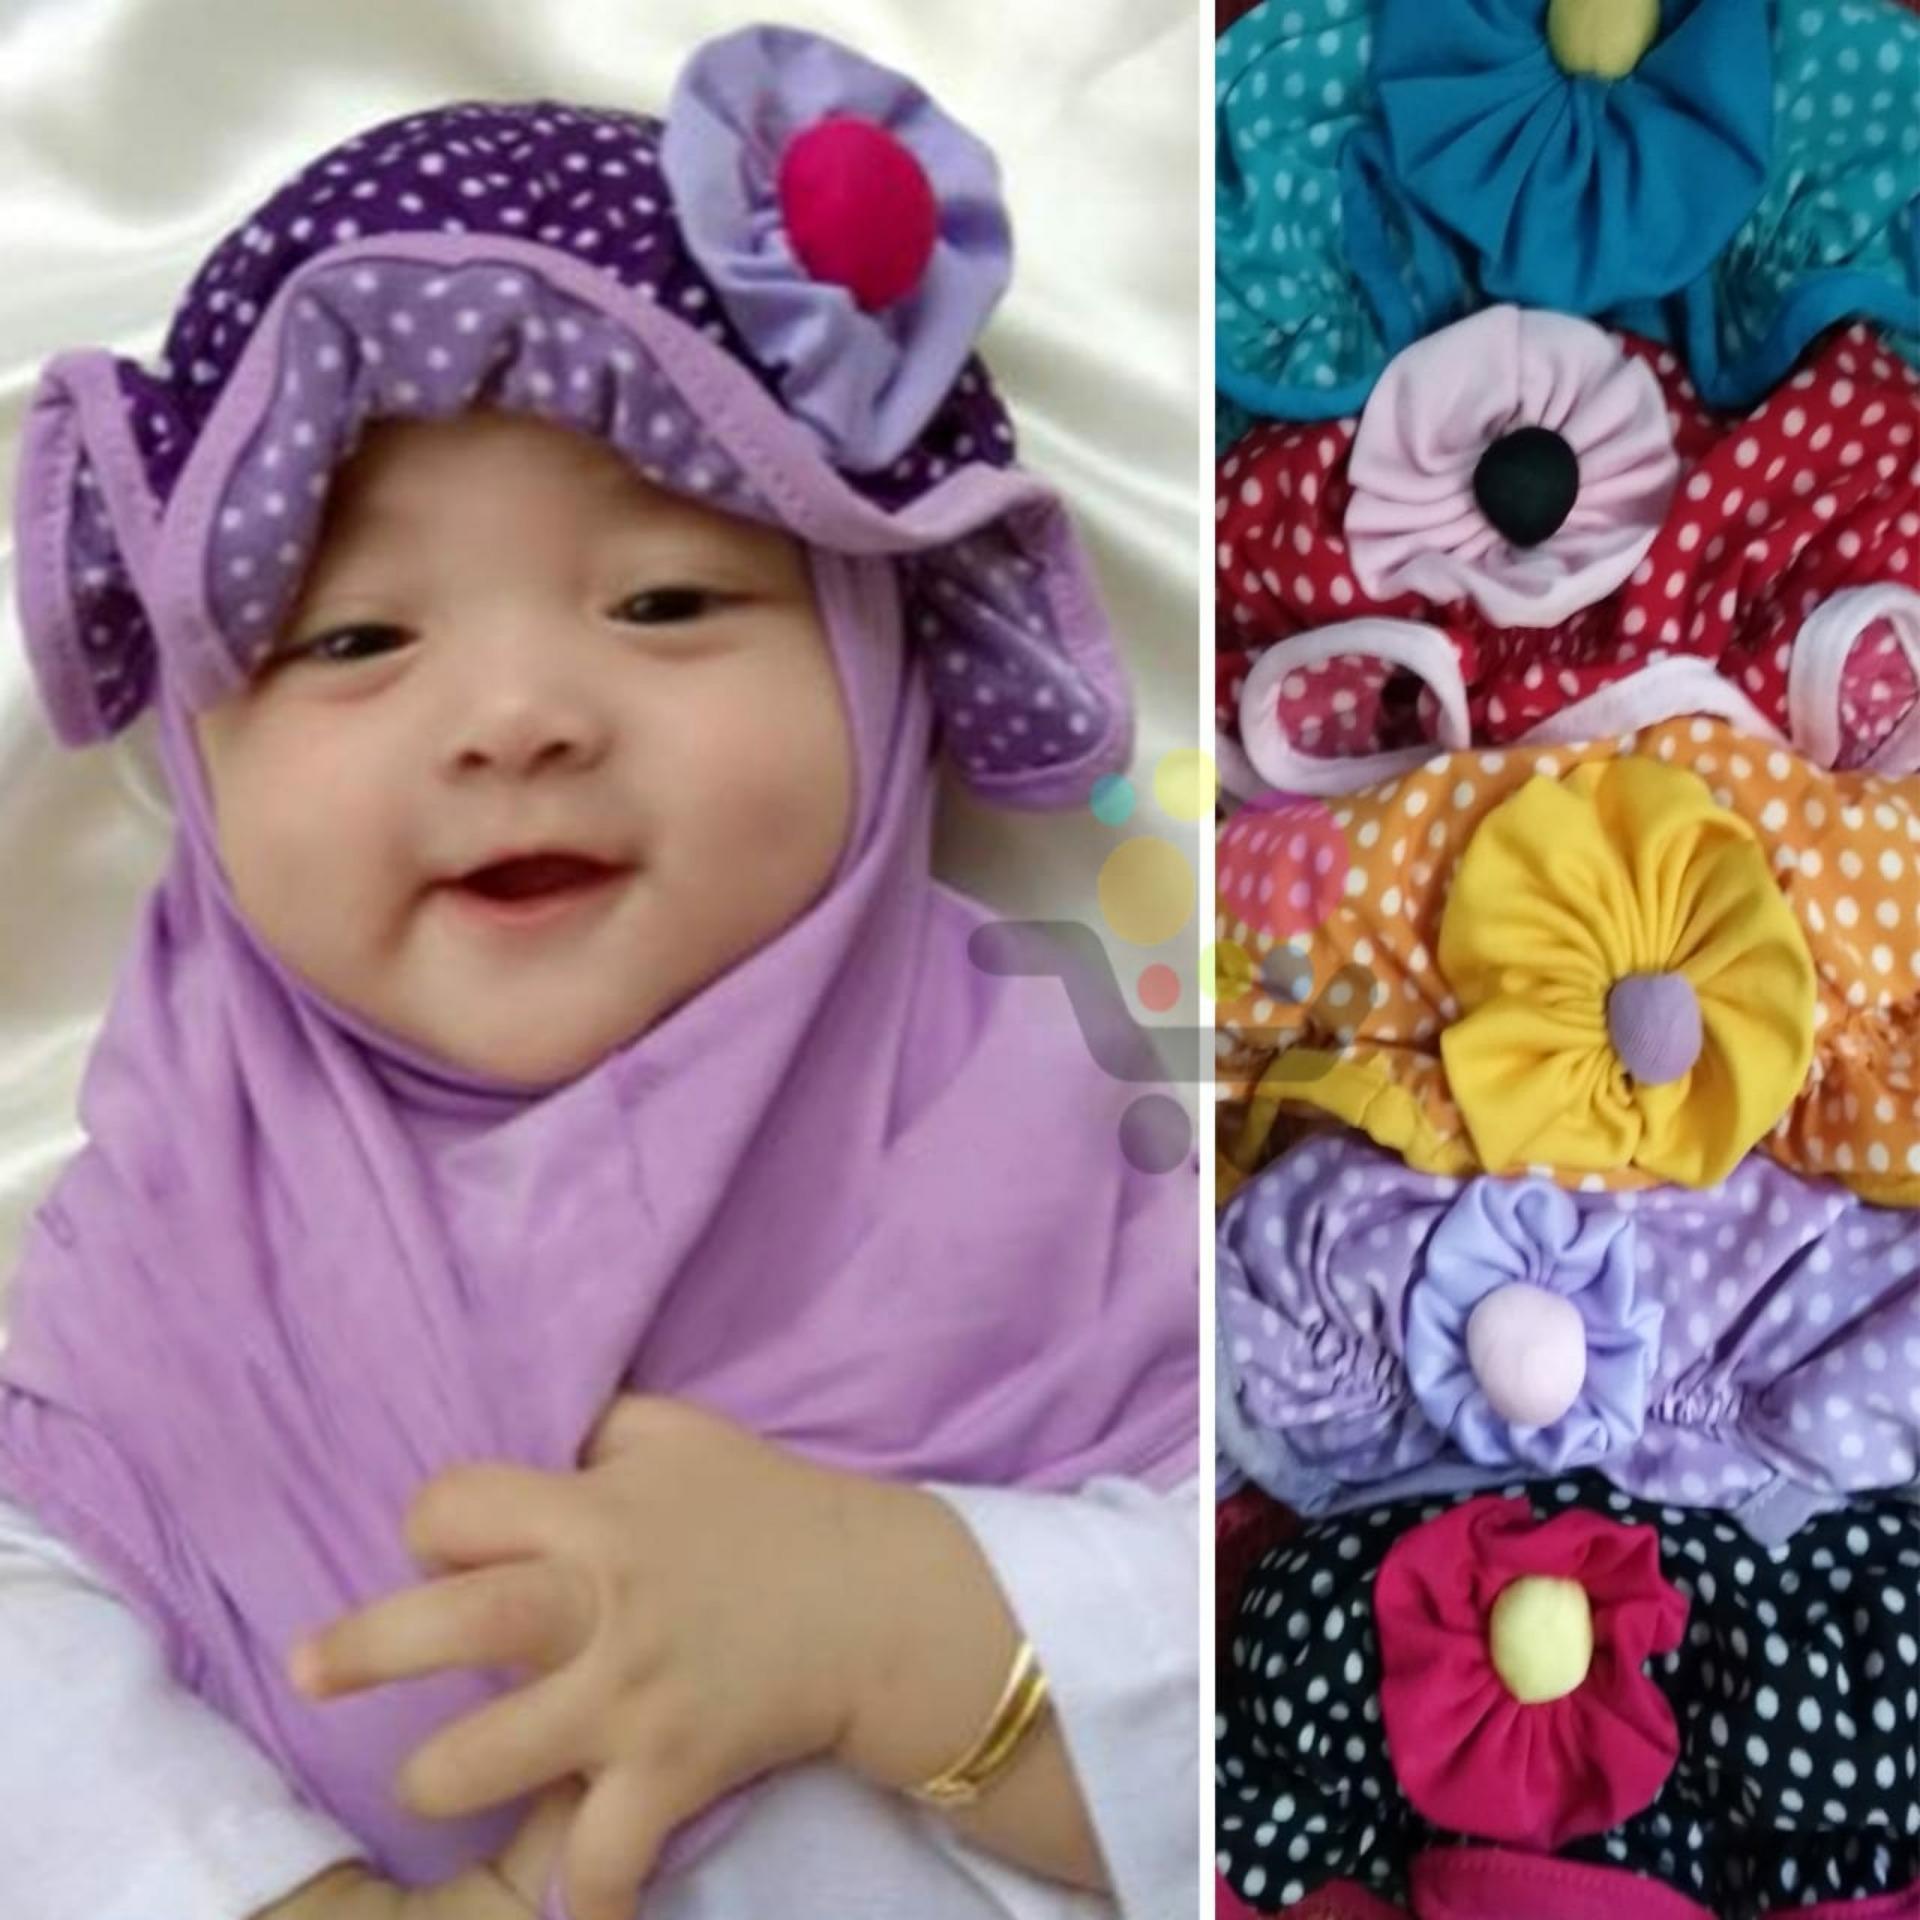 Kerudung polka topi Anak Bayi / Jilbab Anak Bayi / Jilbab Bayi / Hijab Pashmina Instan